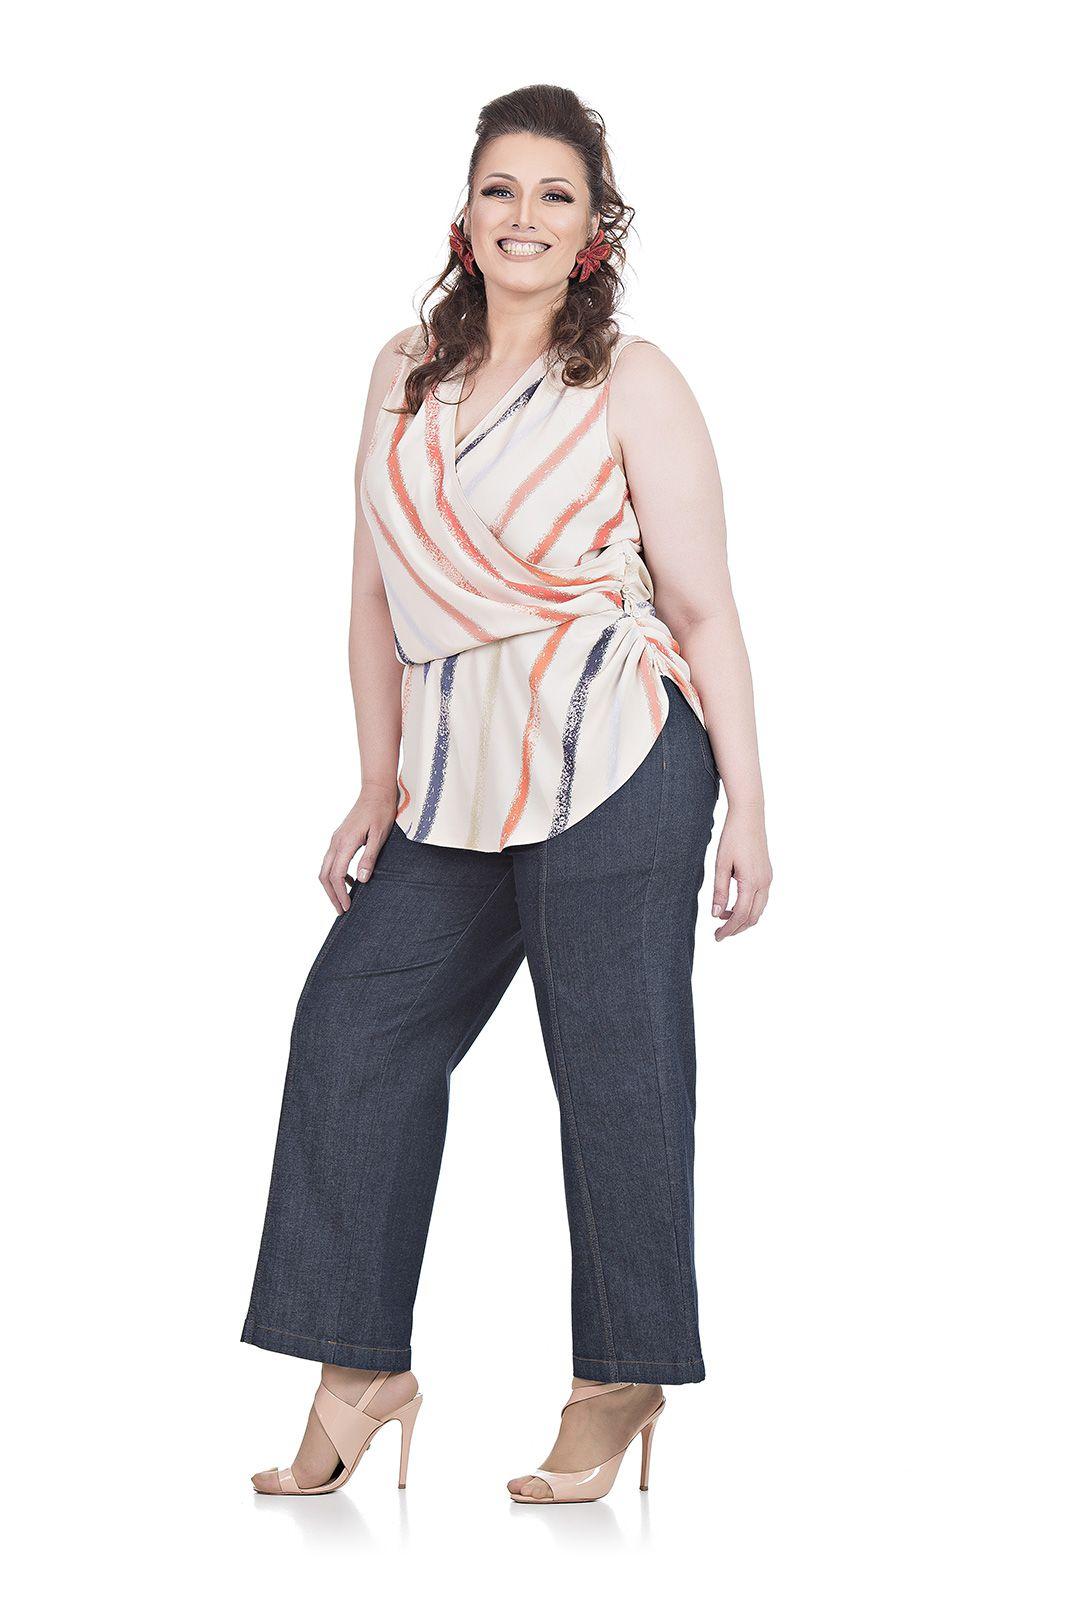 Blusa Decote Transpassado Plus Size